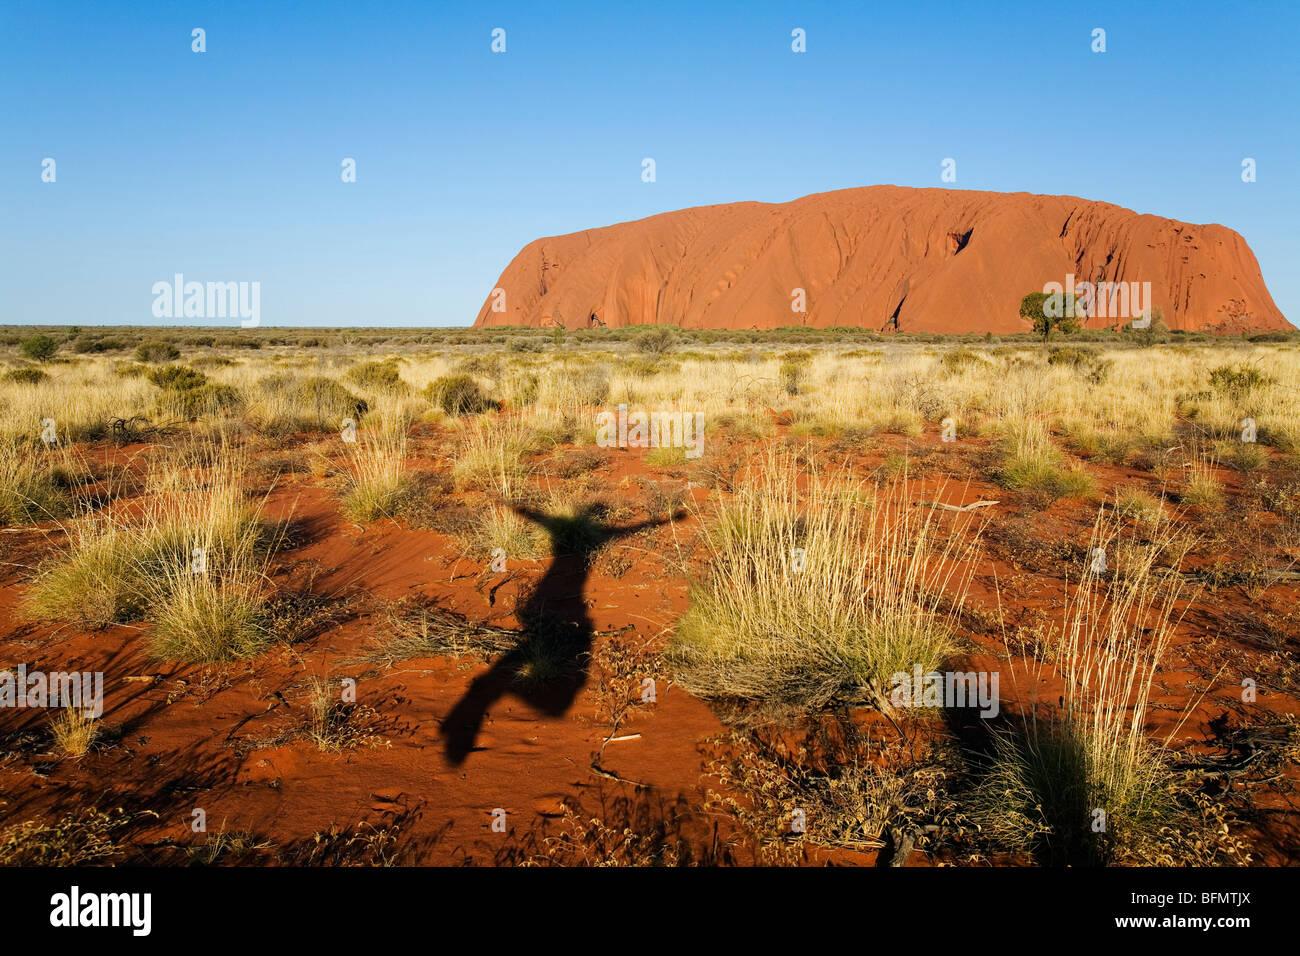 L'Australie, Territoire du Nord, le Parc National d'Uluru-Kata Tjuta. Ombre sauter de joie à Uluru Photo Stock